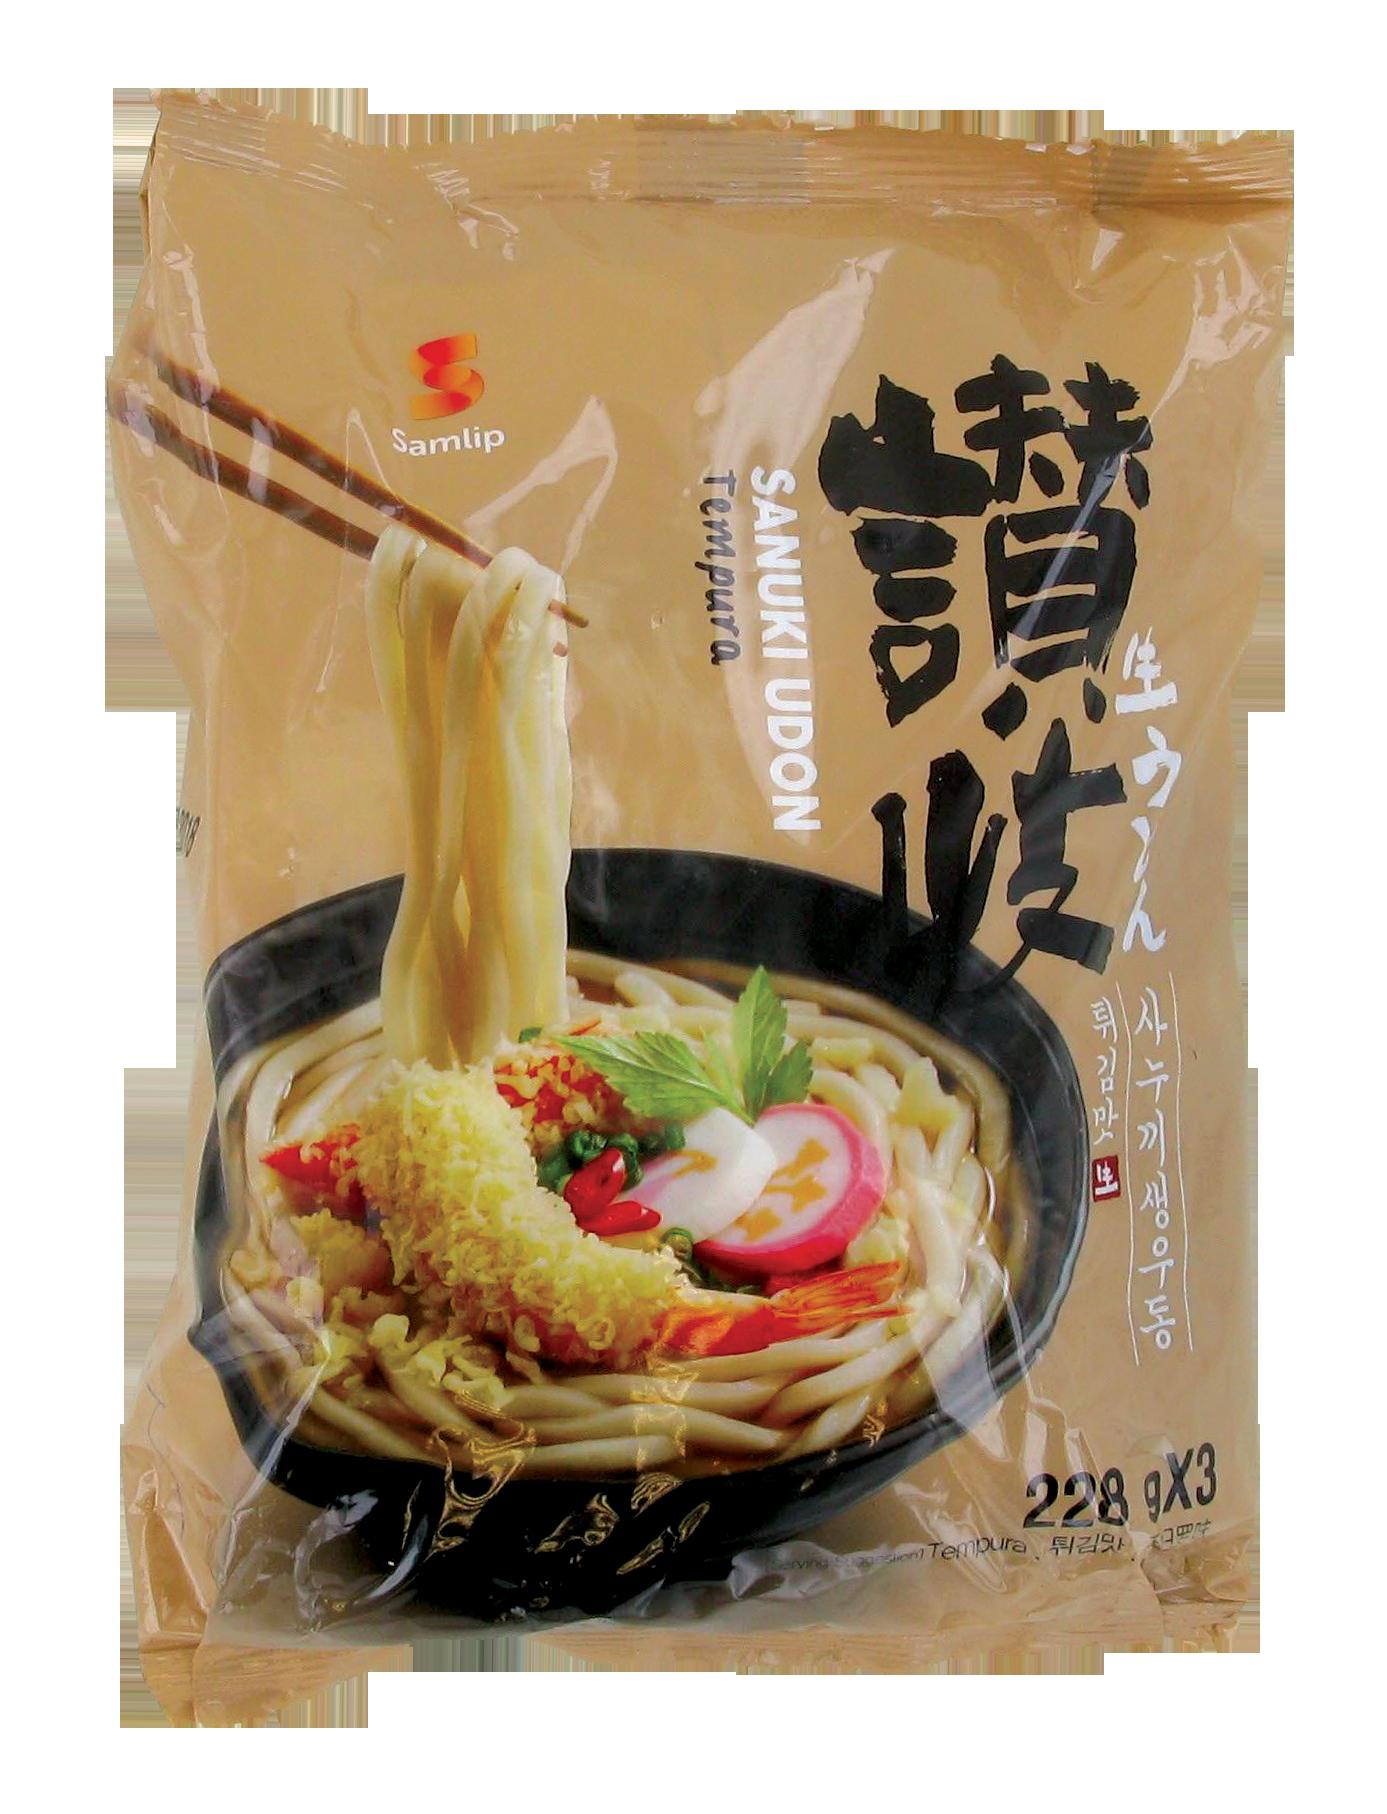 Udon saveur tempura (3 x 228 g)